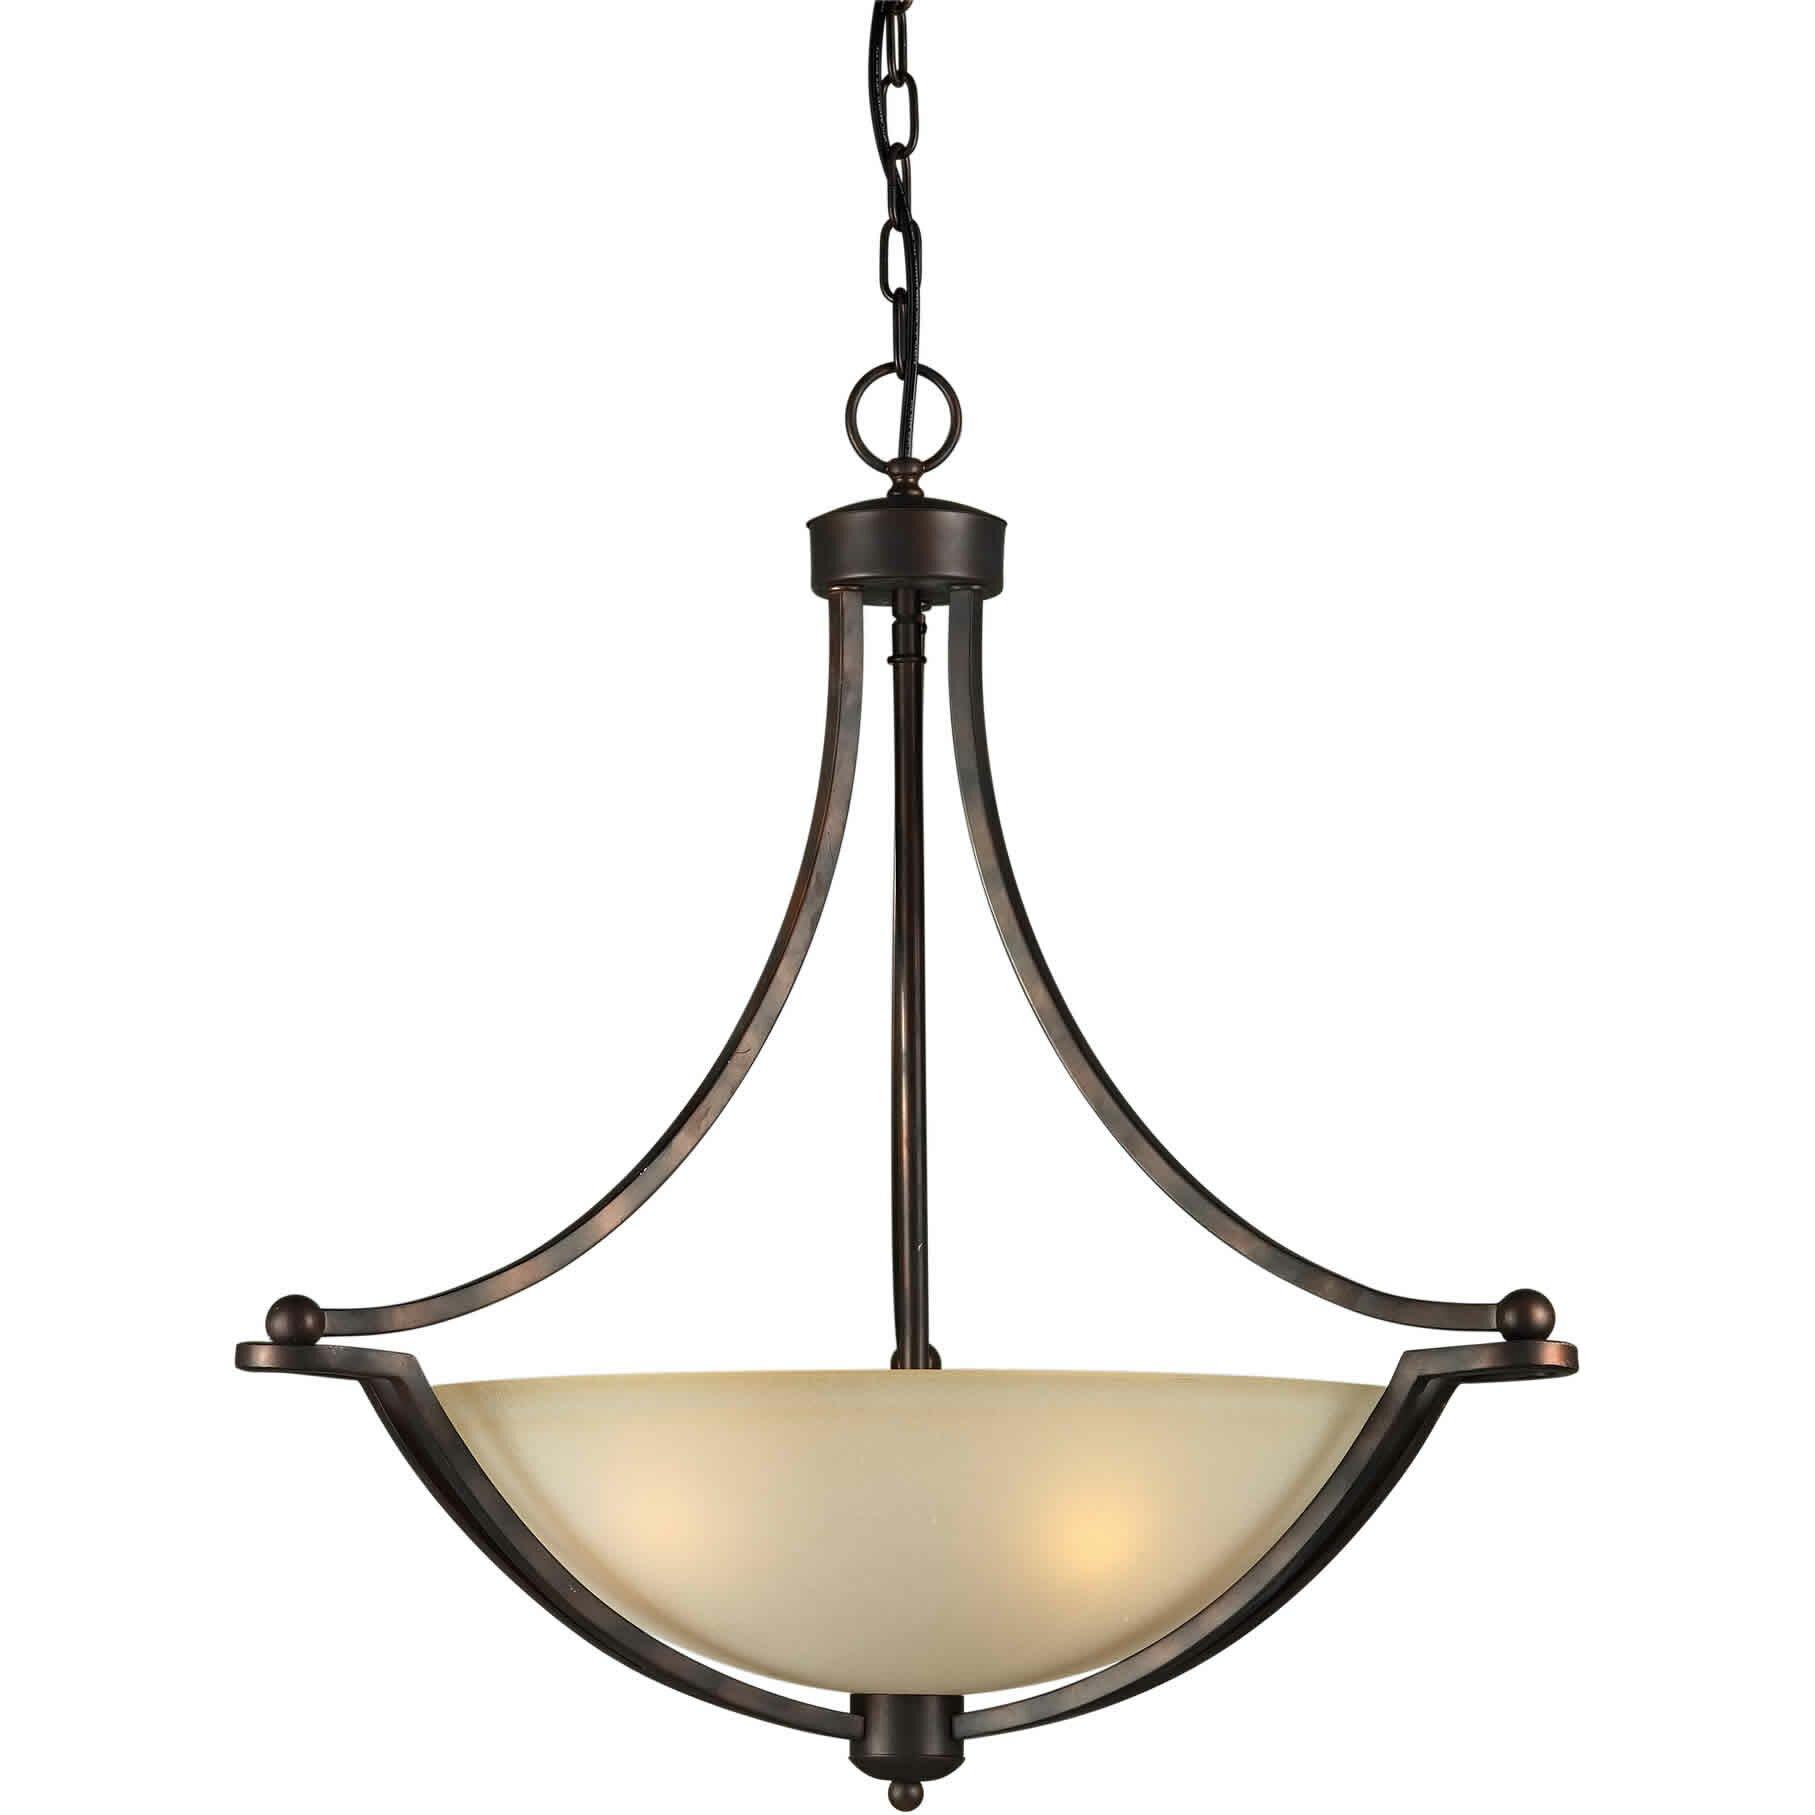 4 light bowl inverted pendant wayfair